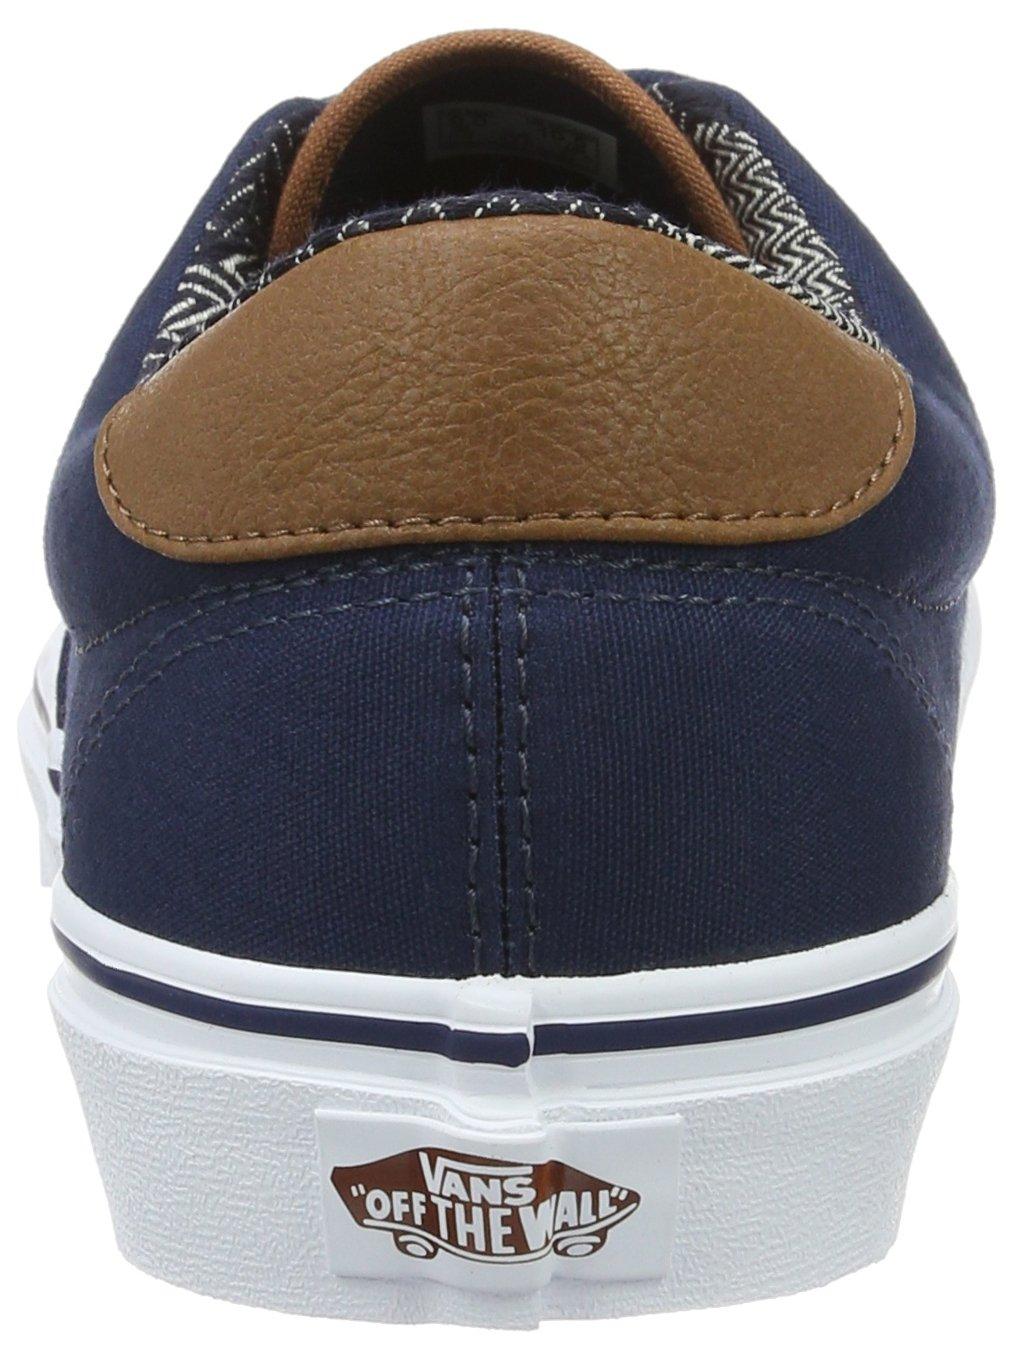 06584a427a Vans Era 59 (C L) - VA38FSMVE C and L Dress Blues Material Mix   Shoes    Clothing